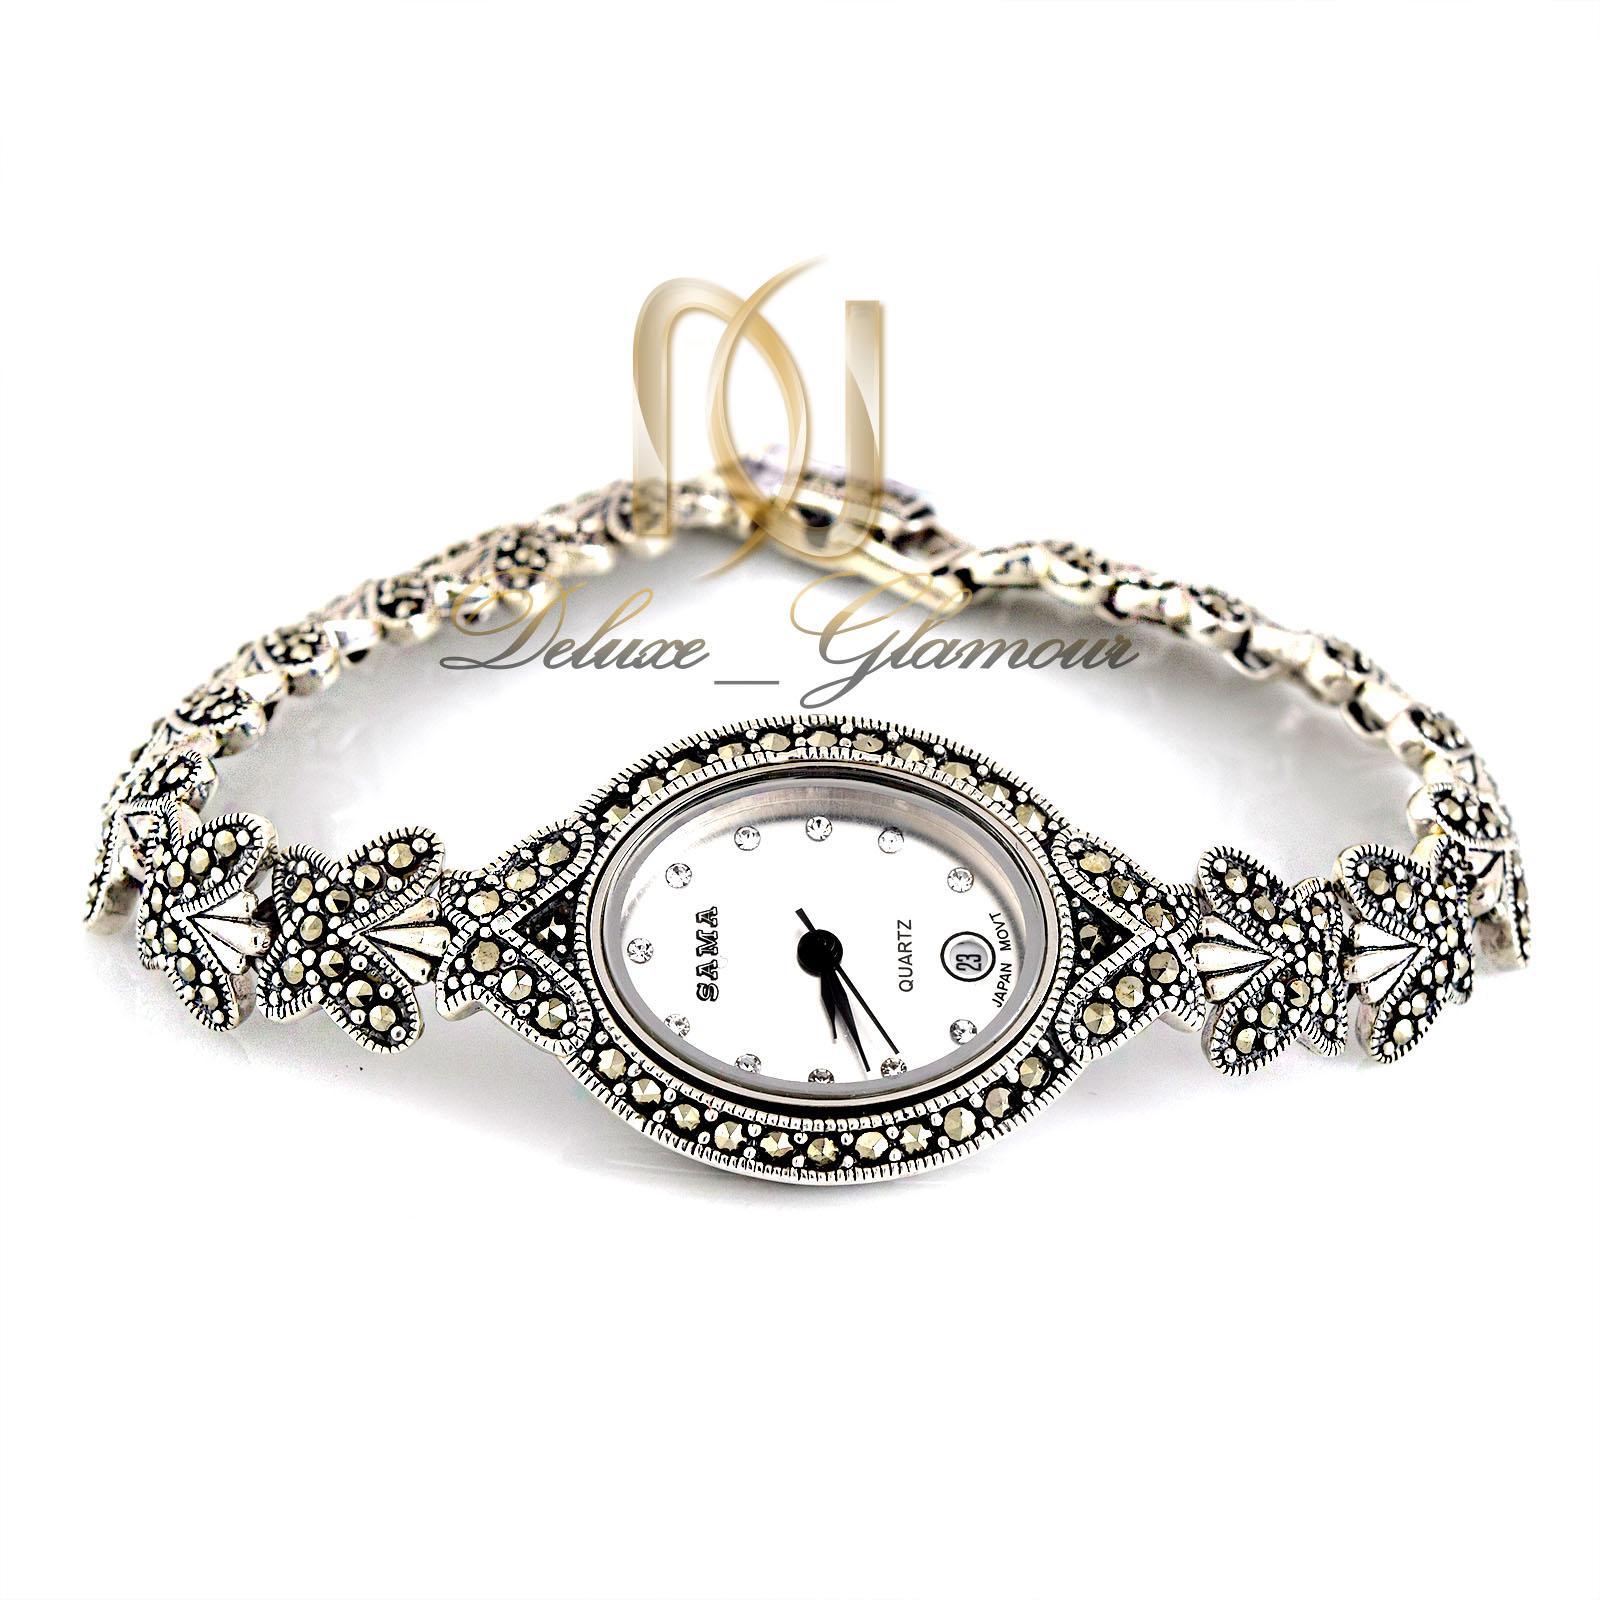 ساعت نقره زنانه طرح پروانه wh-n107 از نماي سفيد